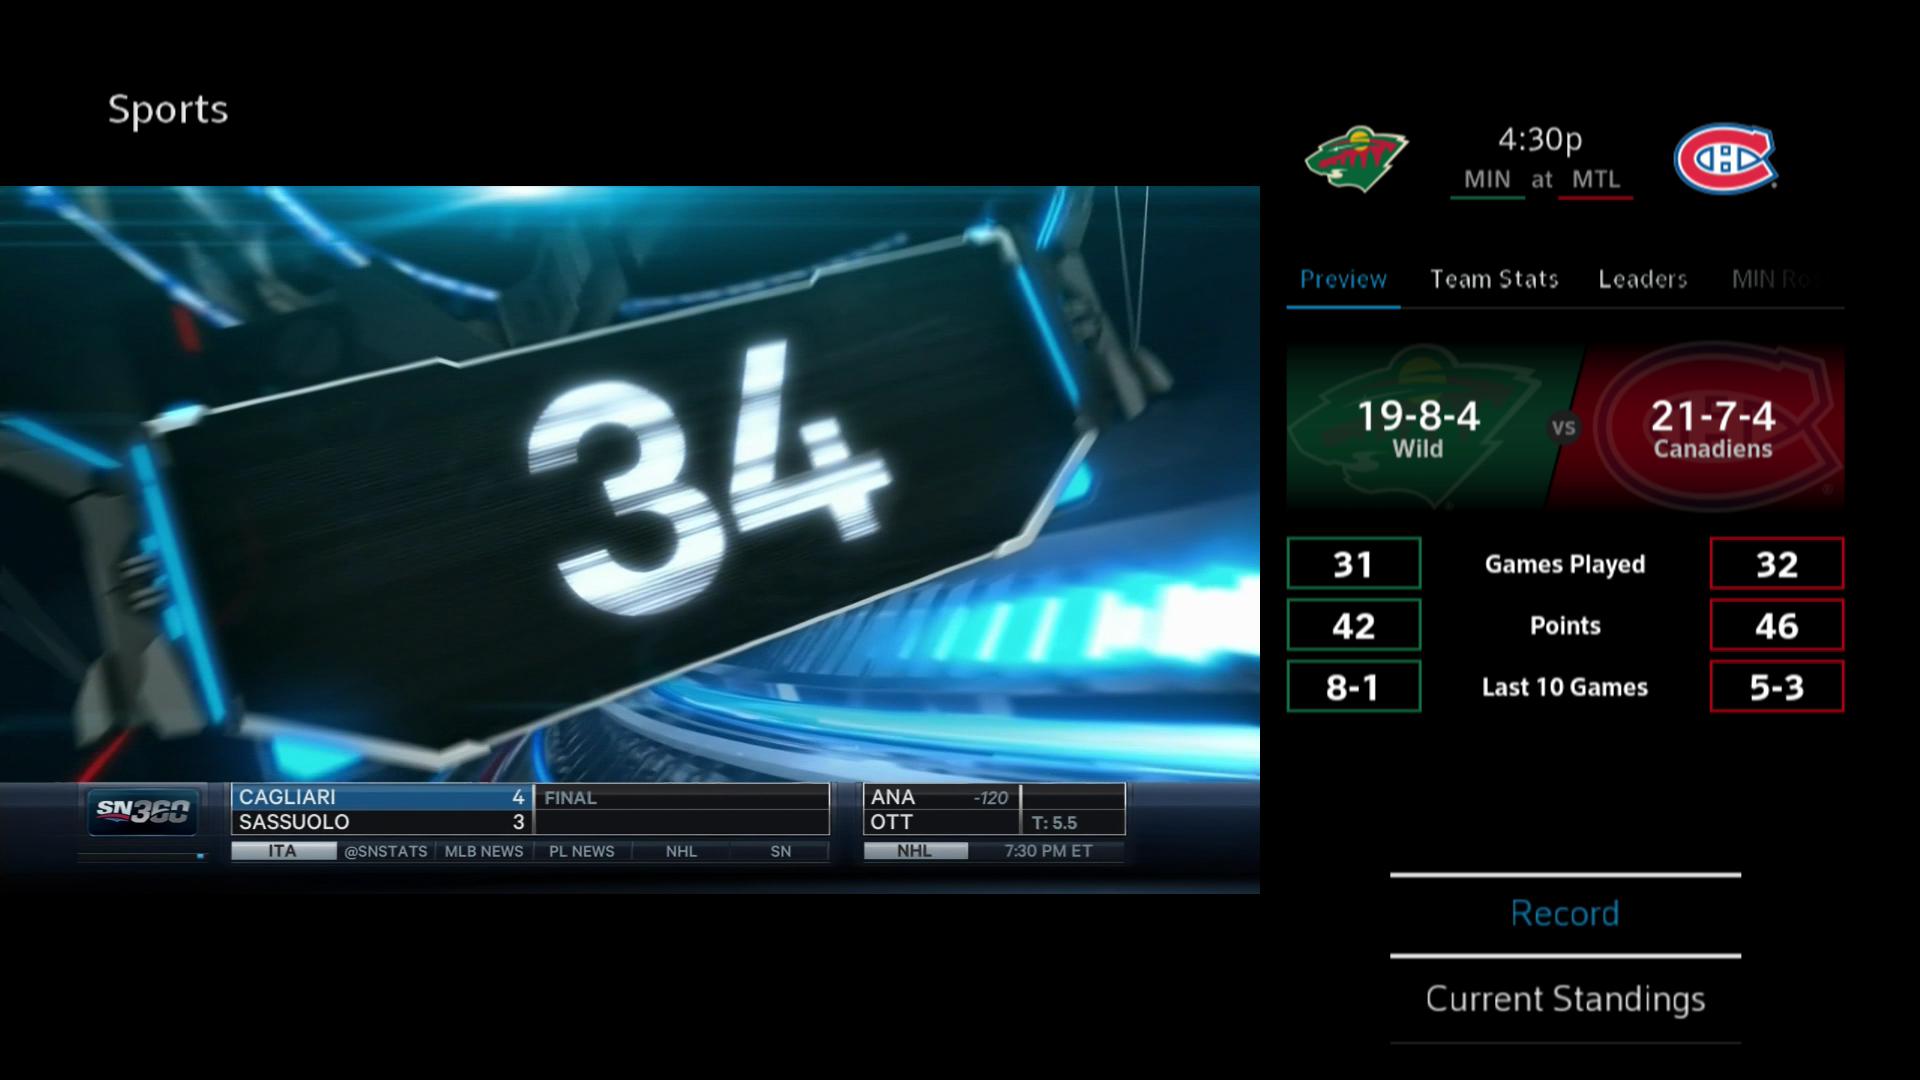 BlueSky TV > Sports App > Record